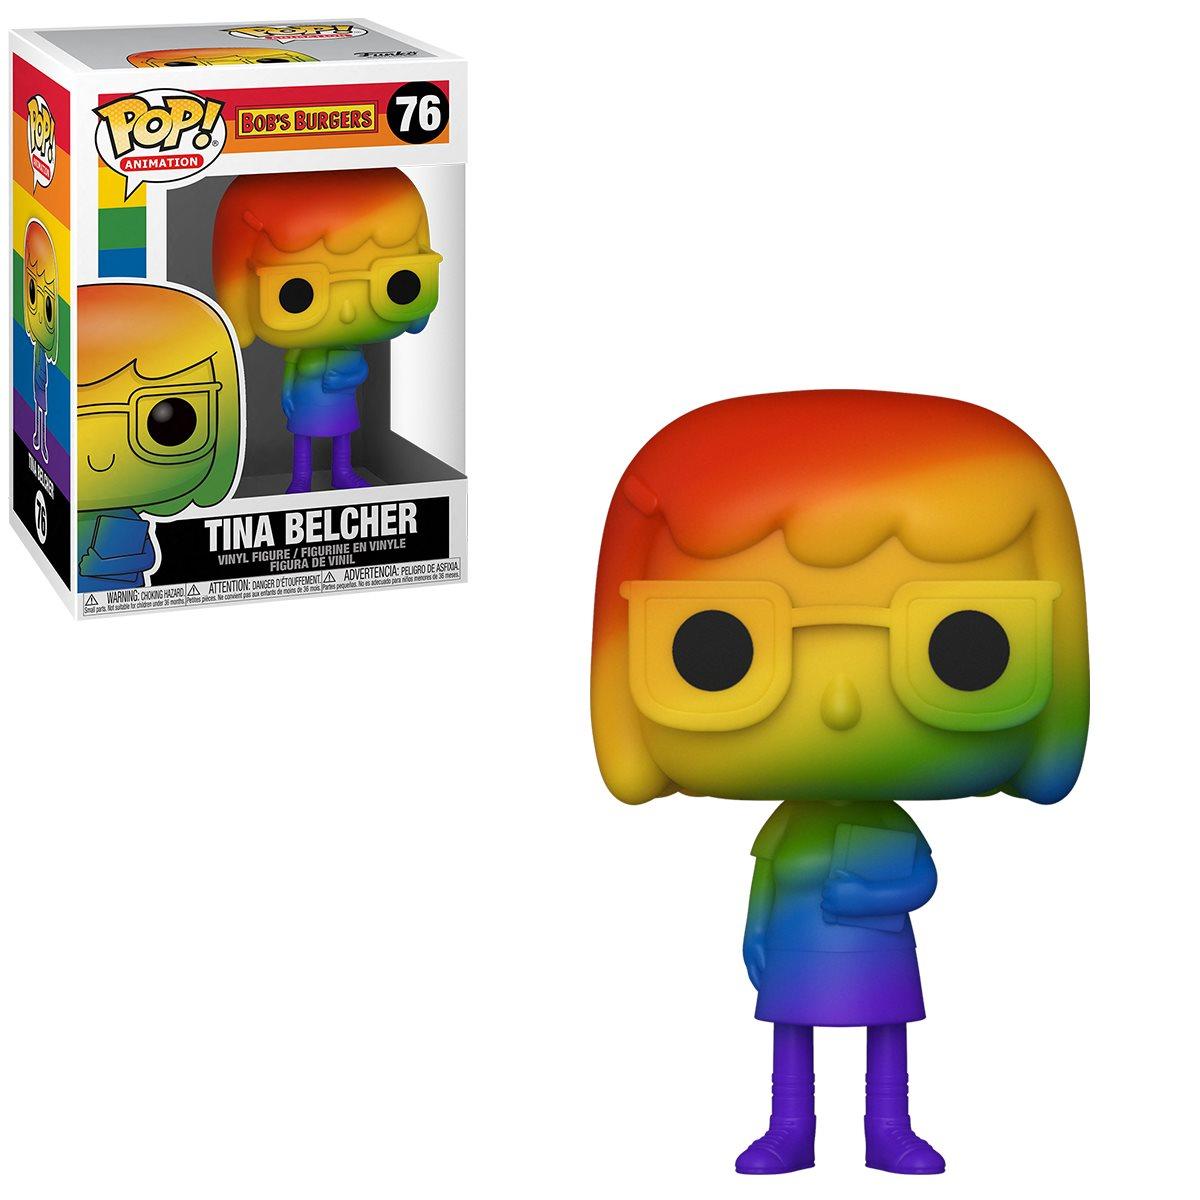 PRÉ VENDA: Funko Pop! Tina Belcher Pride 2021 Rainbow : Bob's Burger #76 - Funko